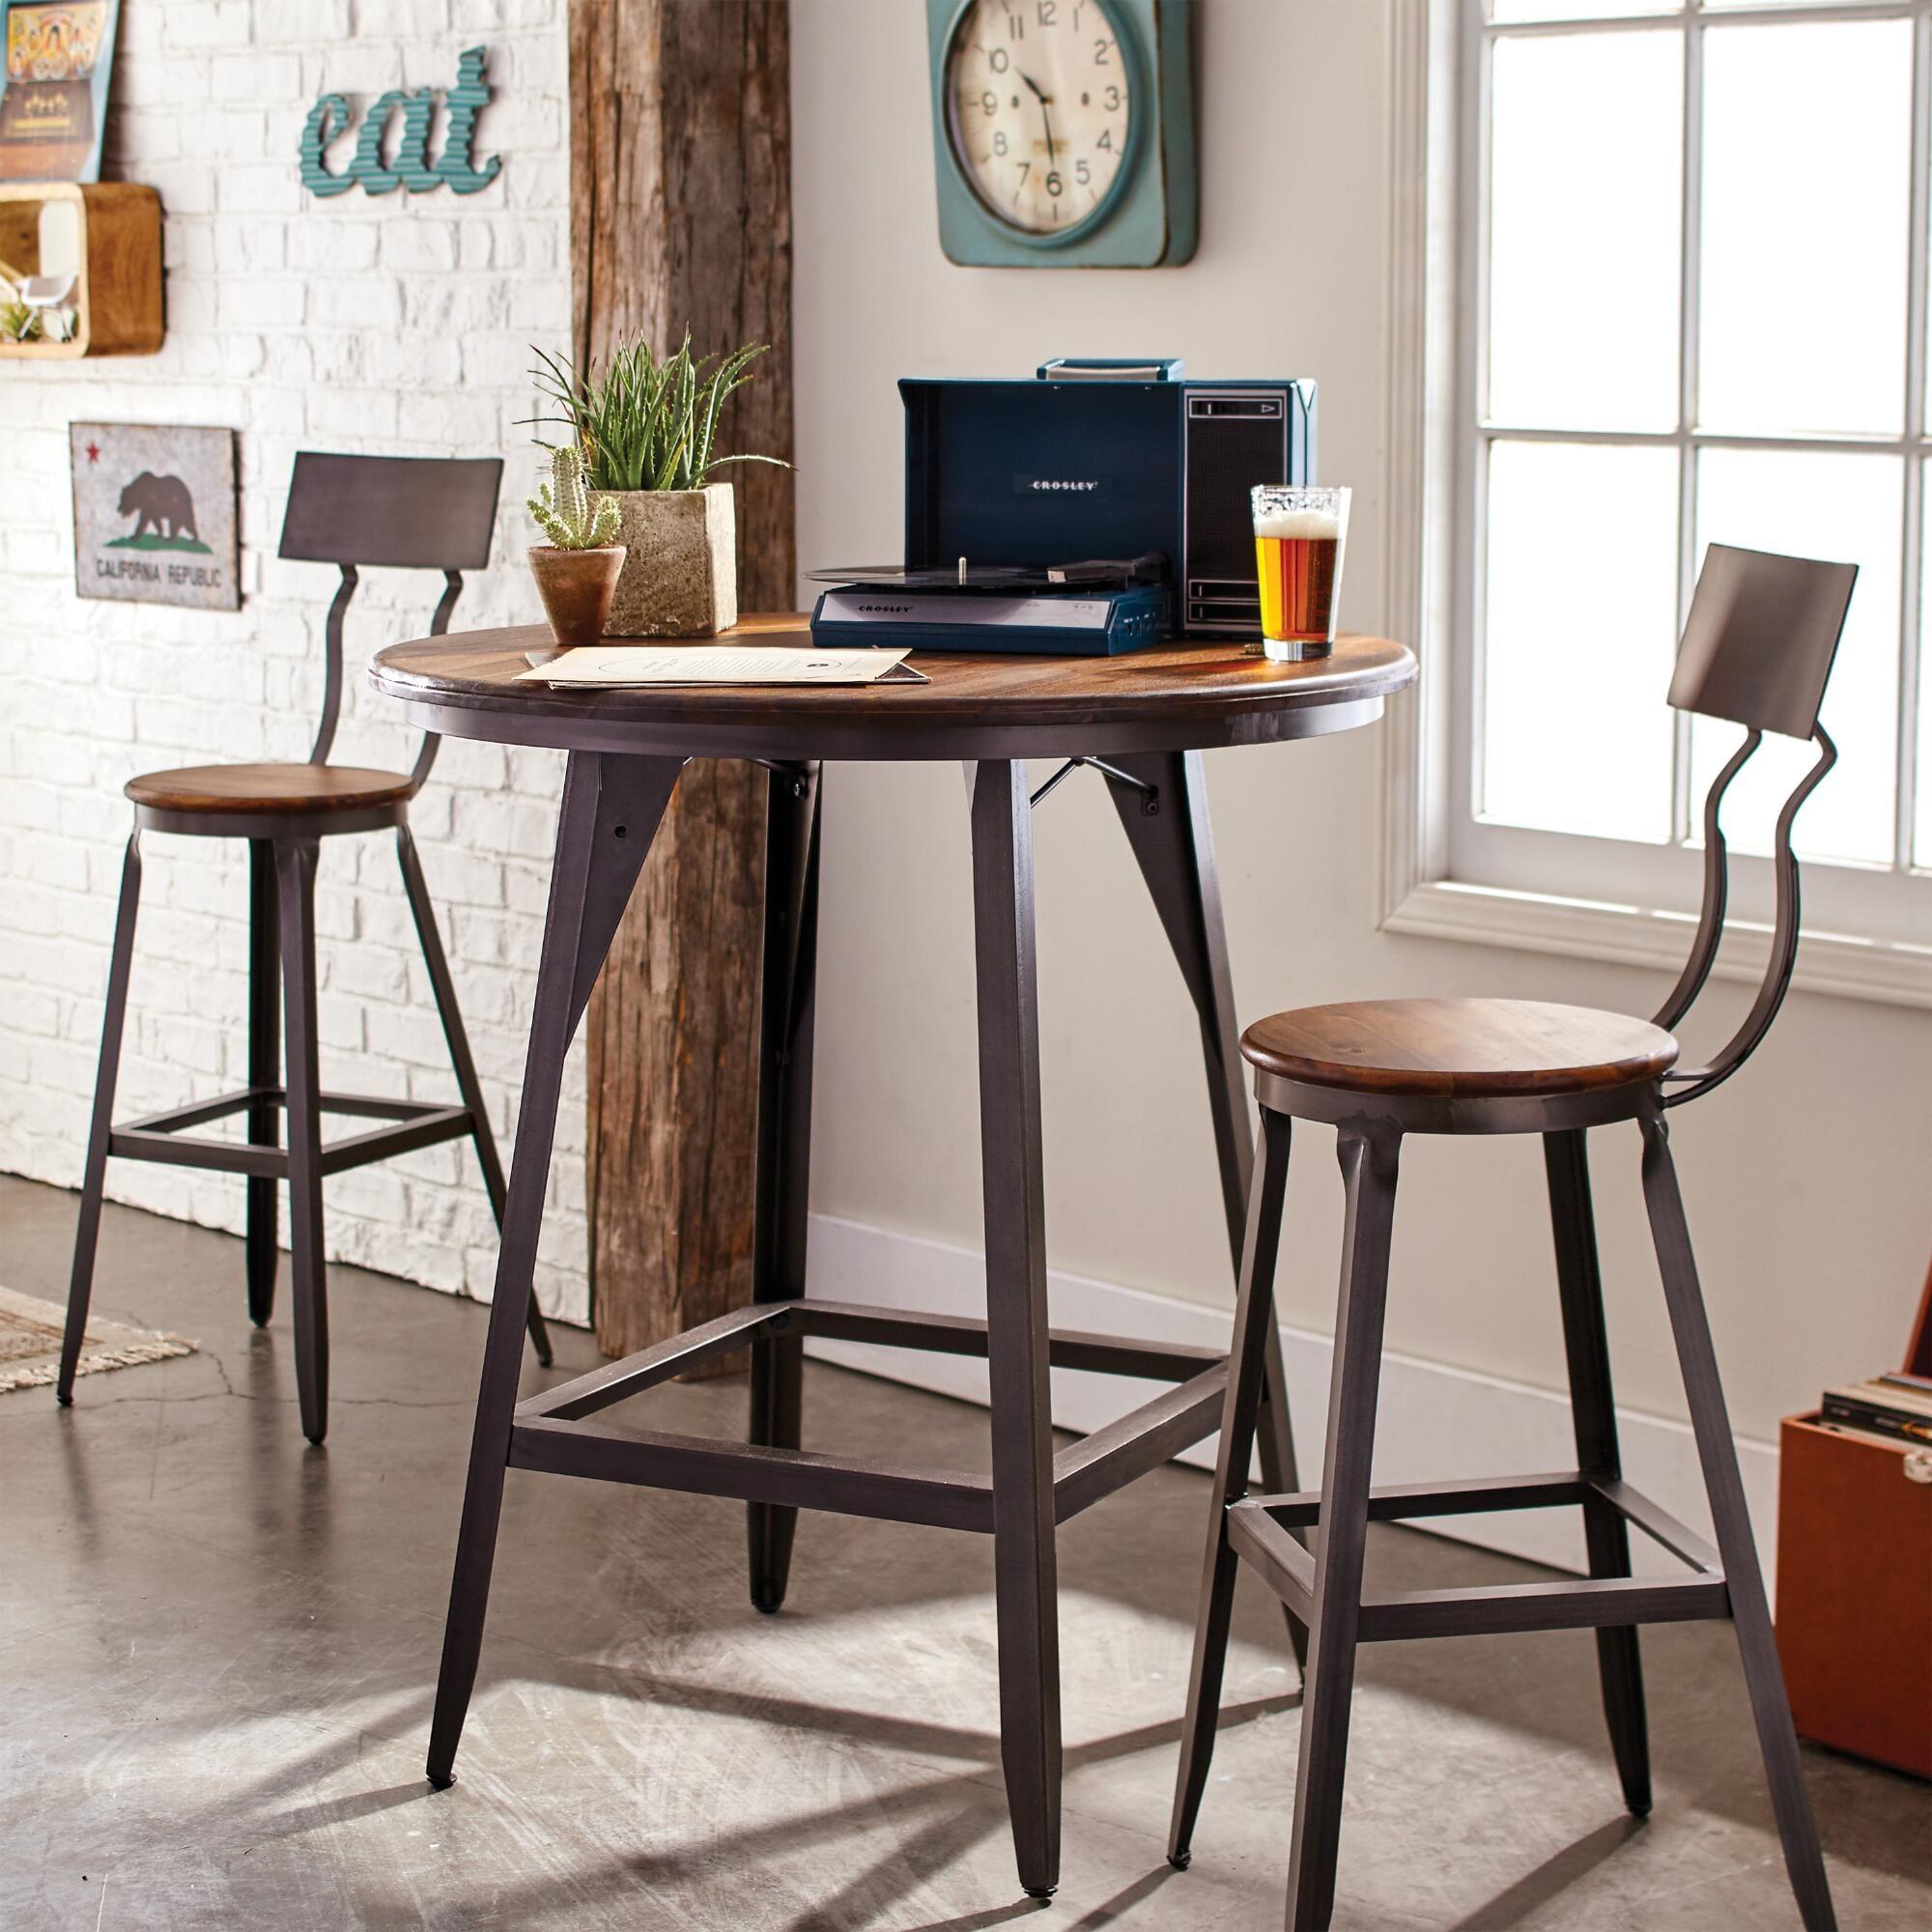 Best Apartment Furniture From World Market | POPSUGAR Home